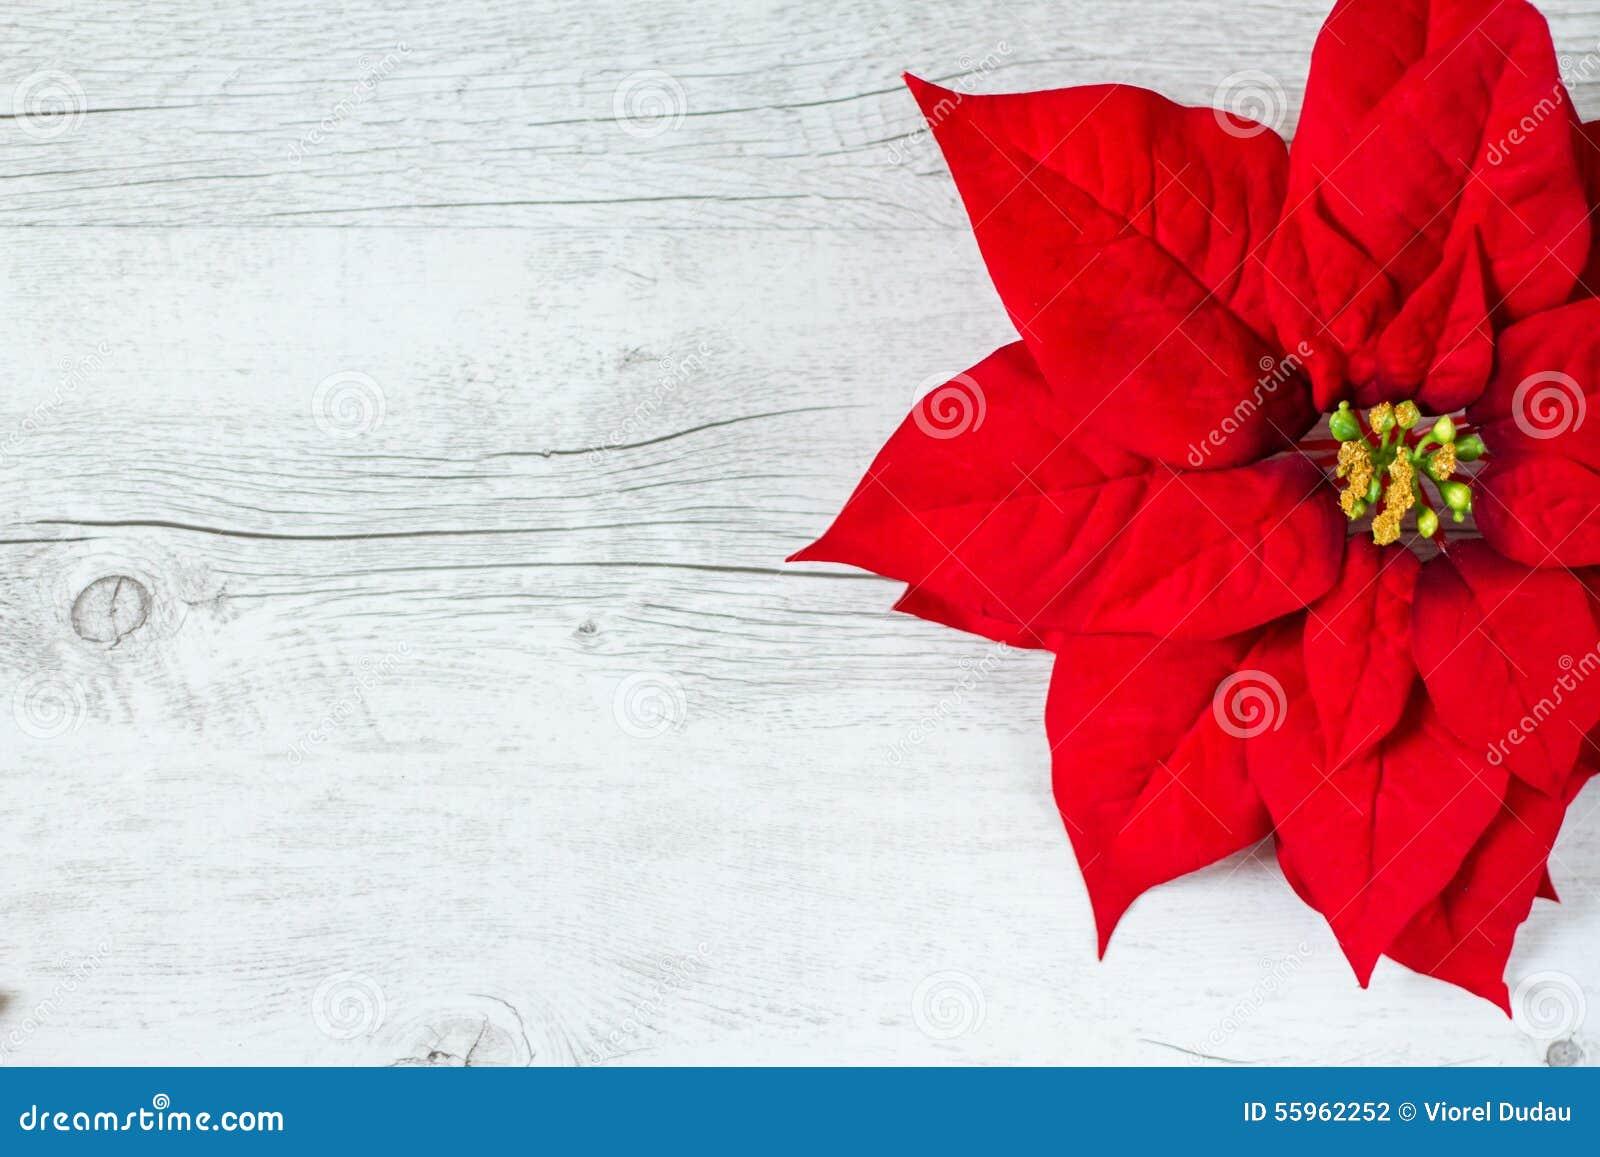 Poinsettia Christmas Flower Stock Photo Image 55962252